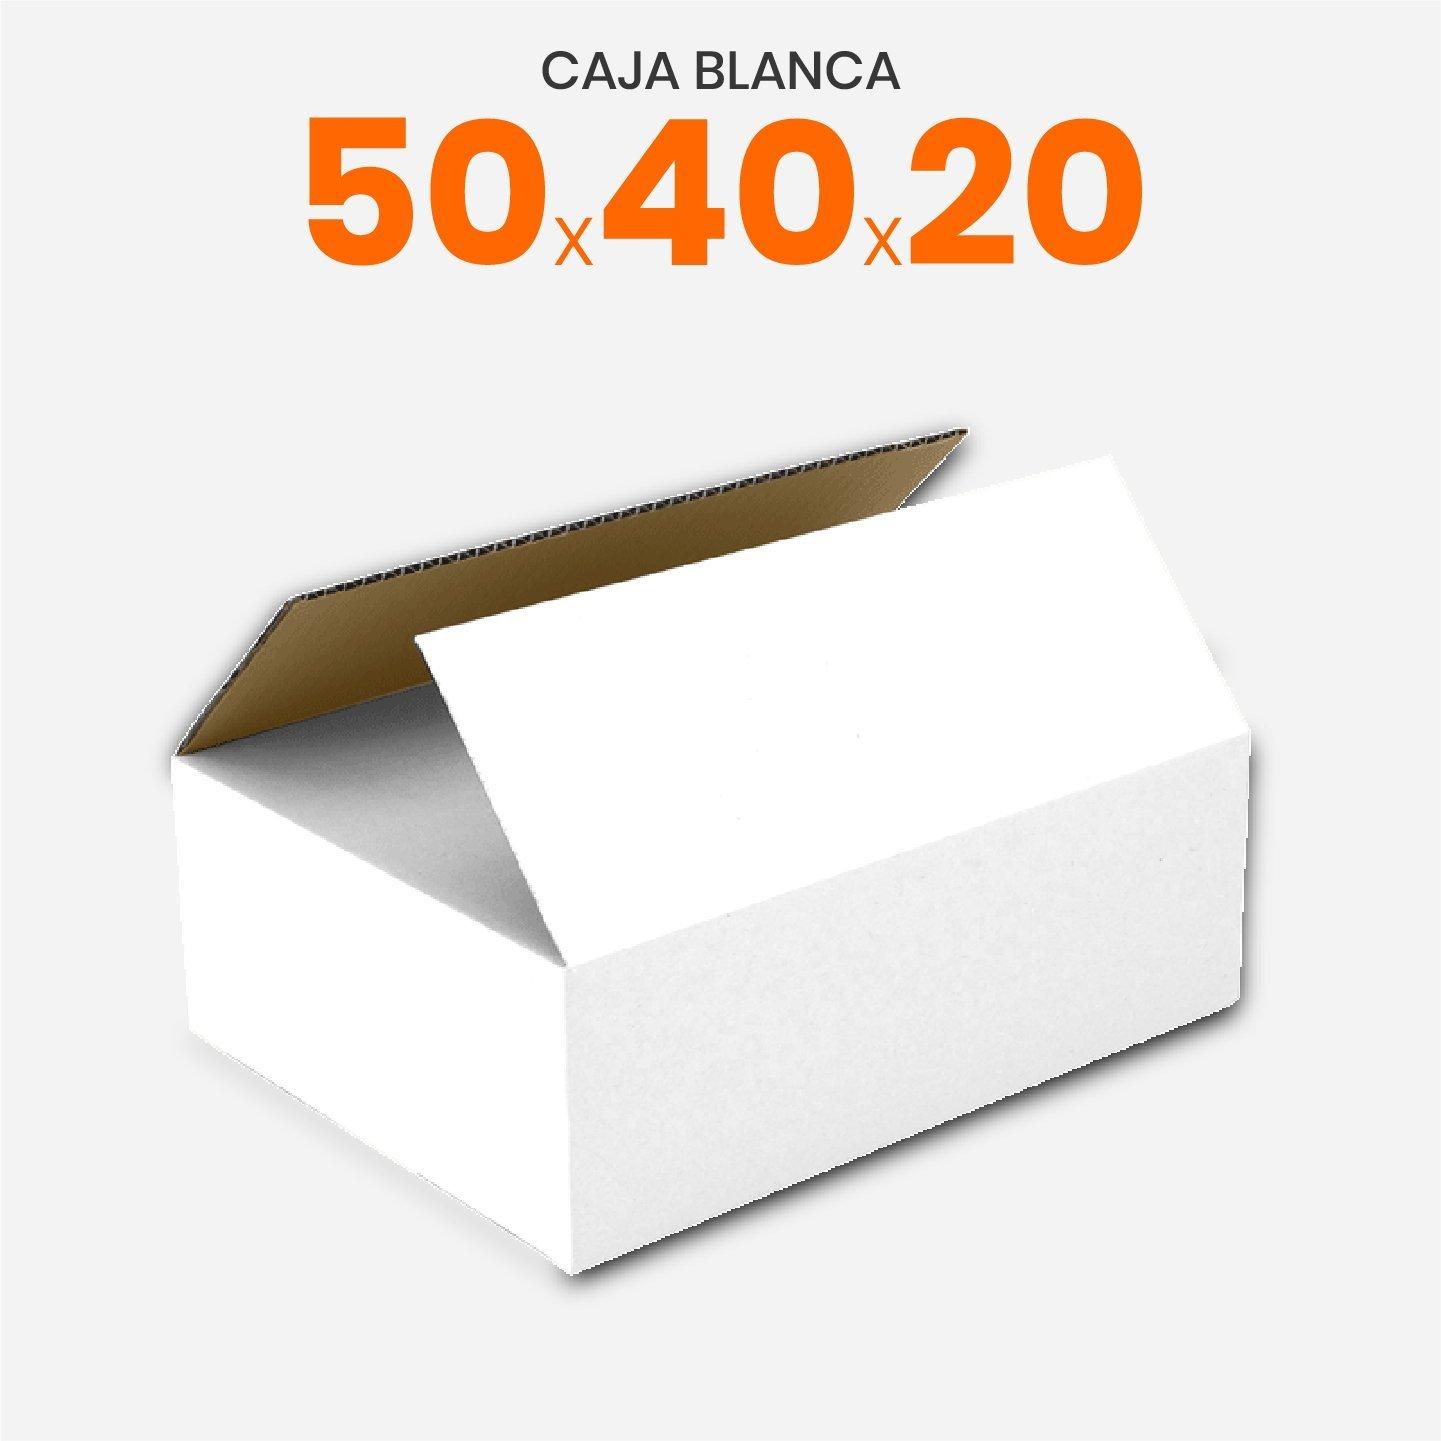 Caja De Cartón Corrugado Blanca 50x40x20